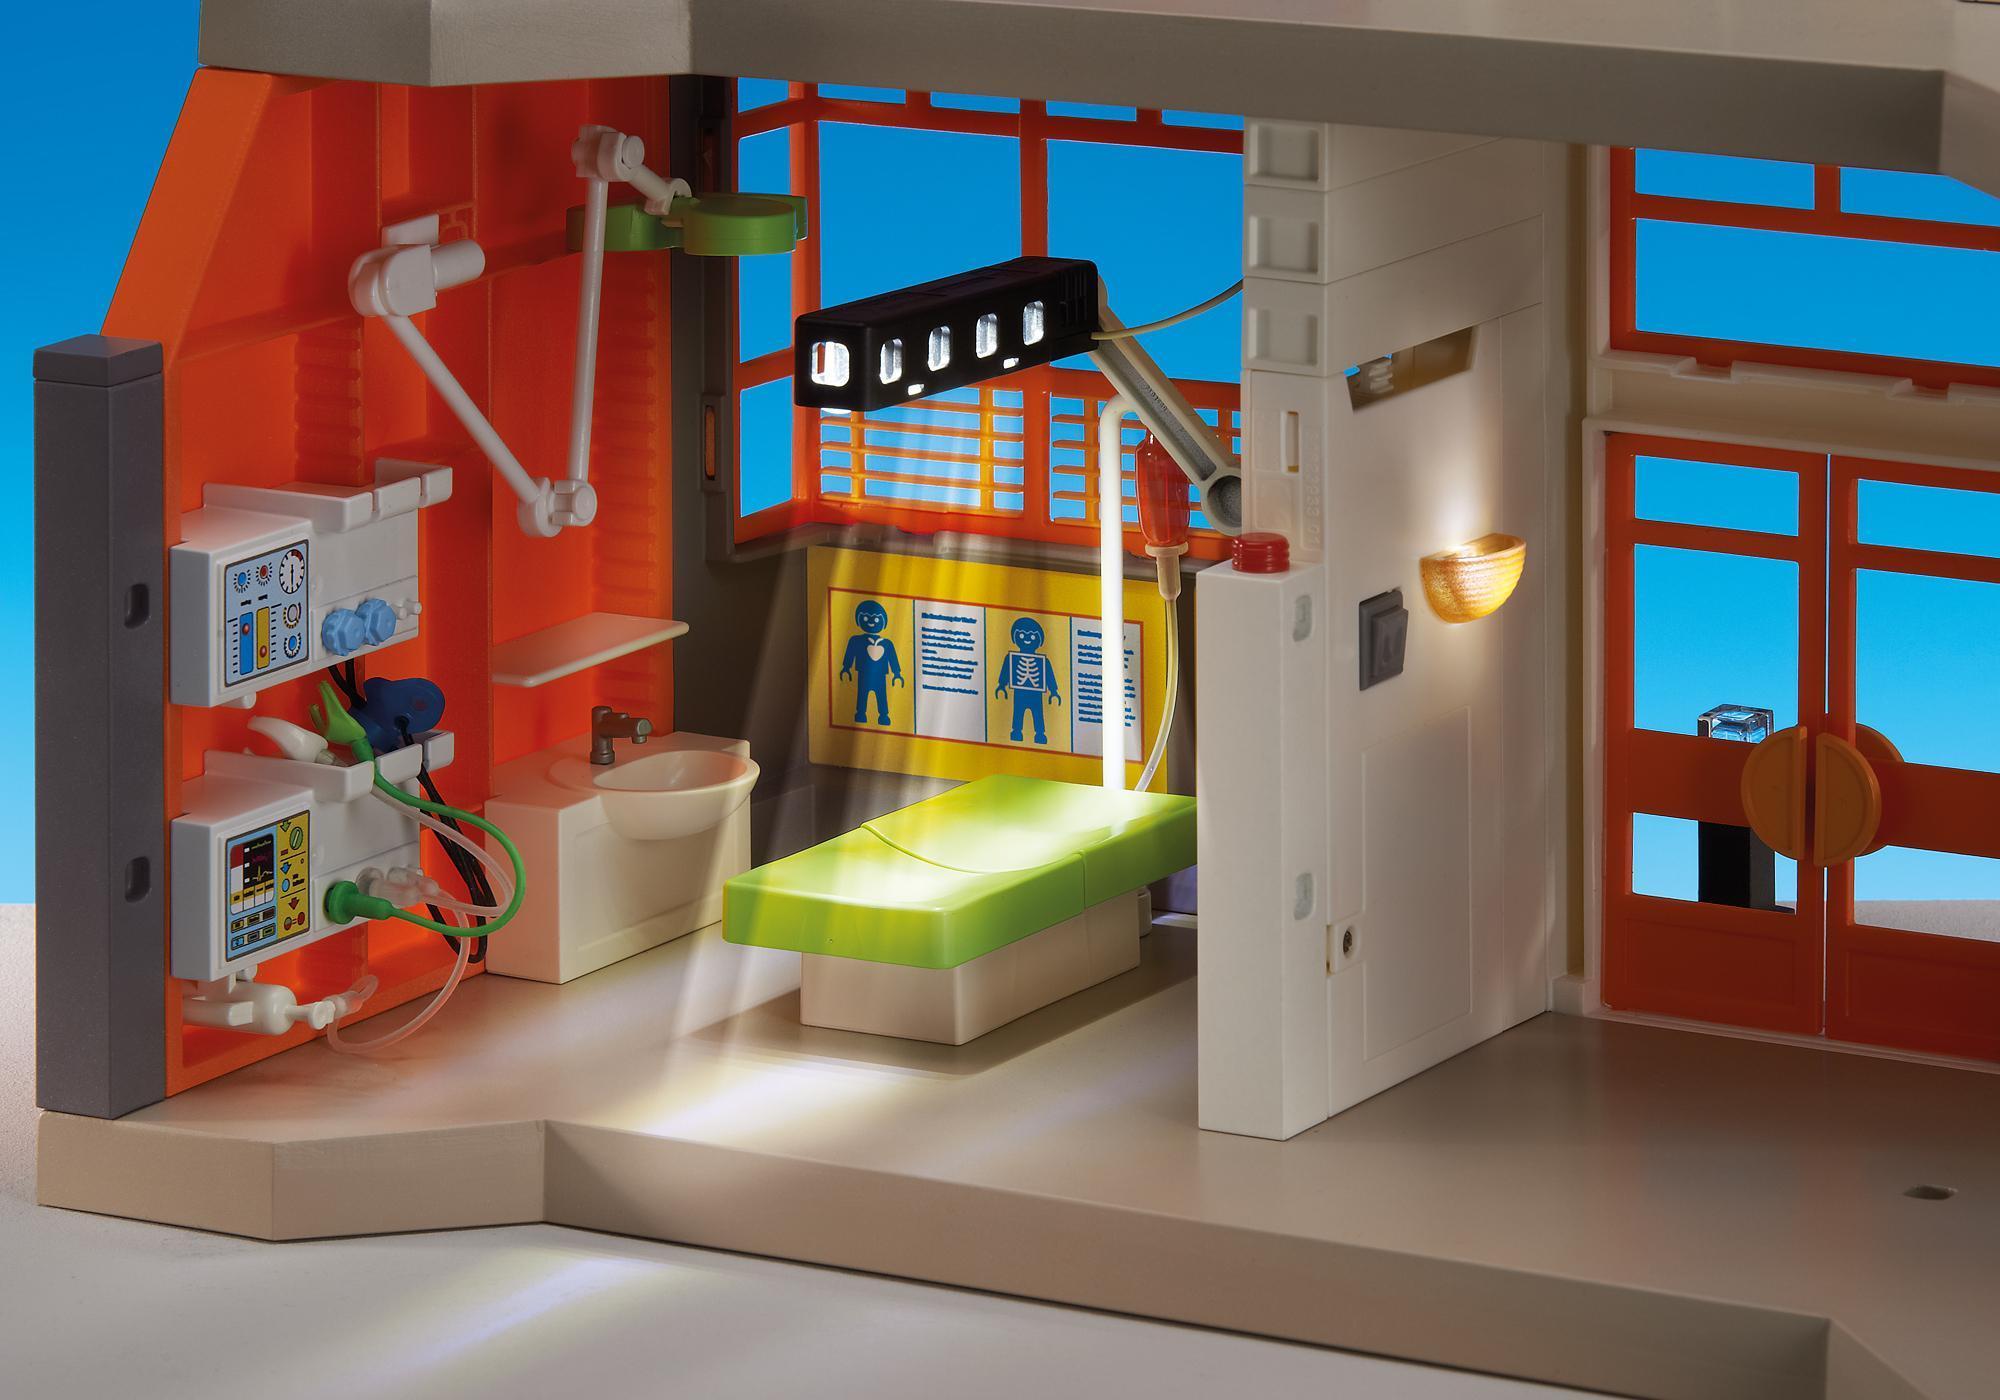 http://media.playmobil.com/i/playmobil/6446_product_extra1/Verlichtingsset voor Kinderziekenhuis